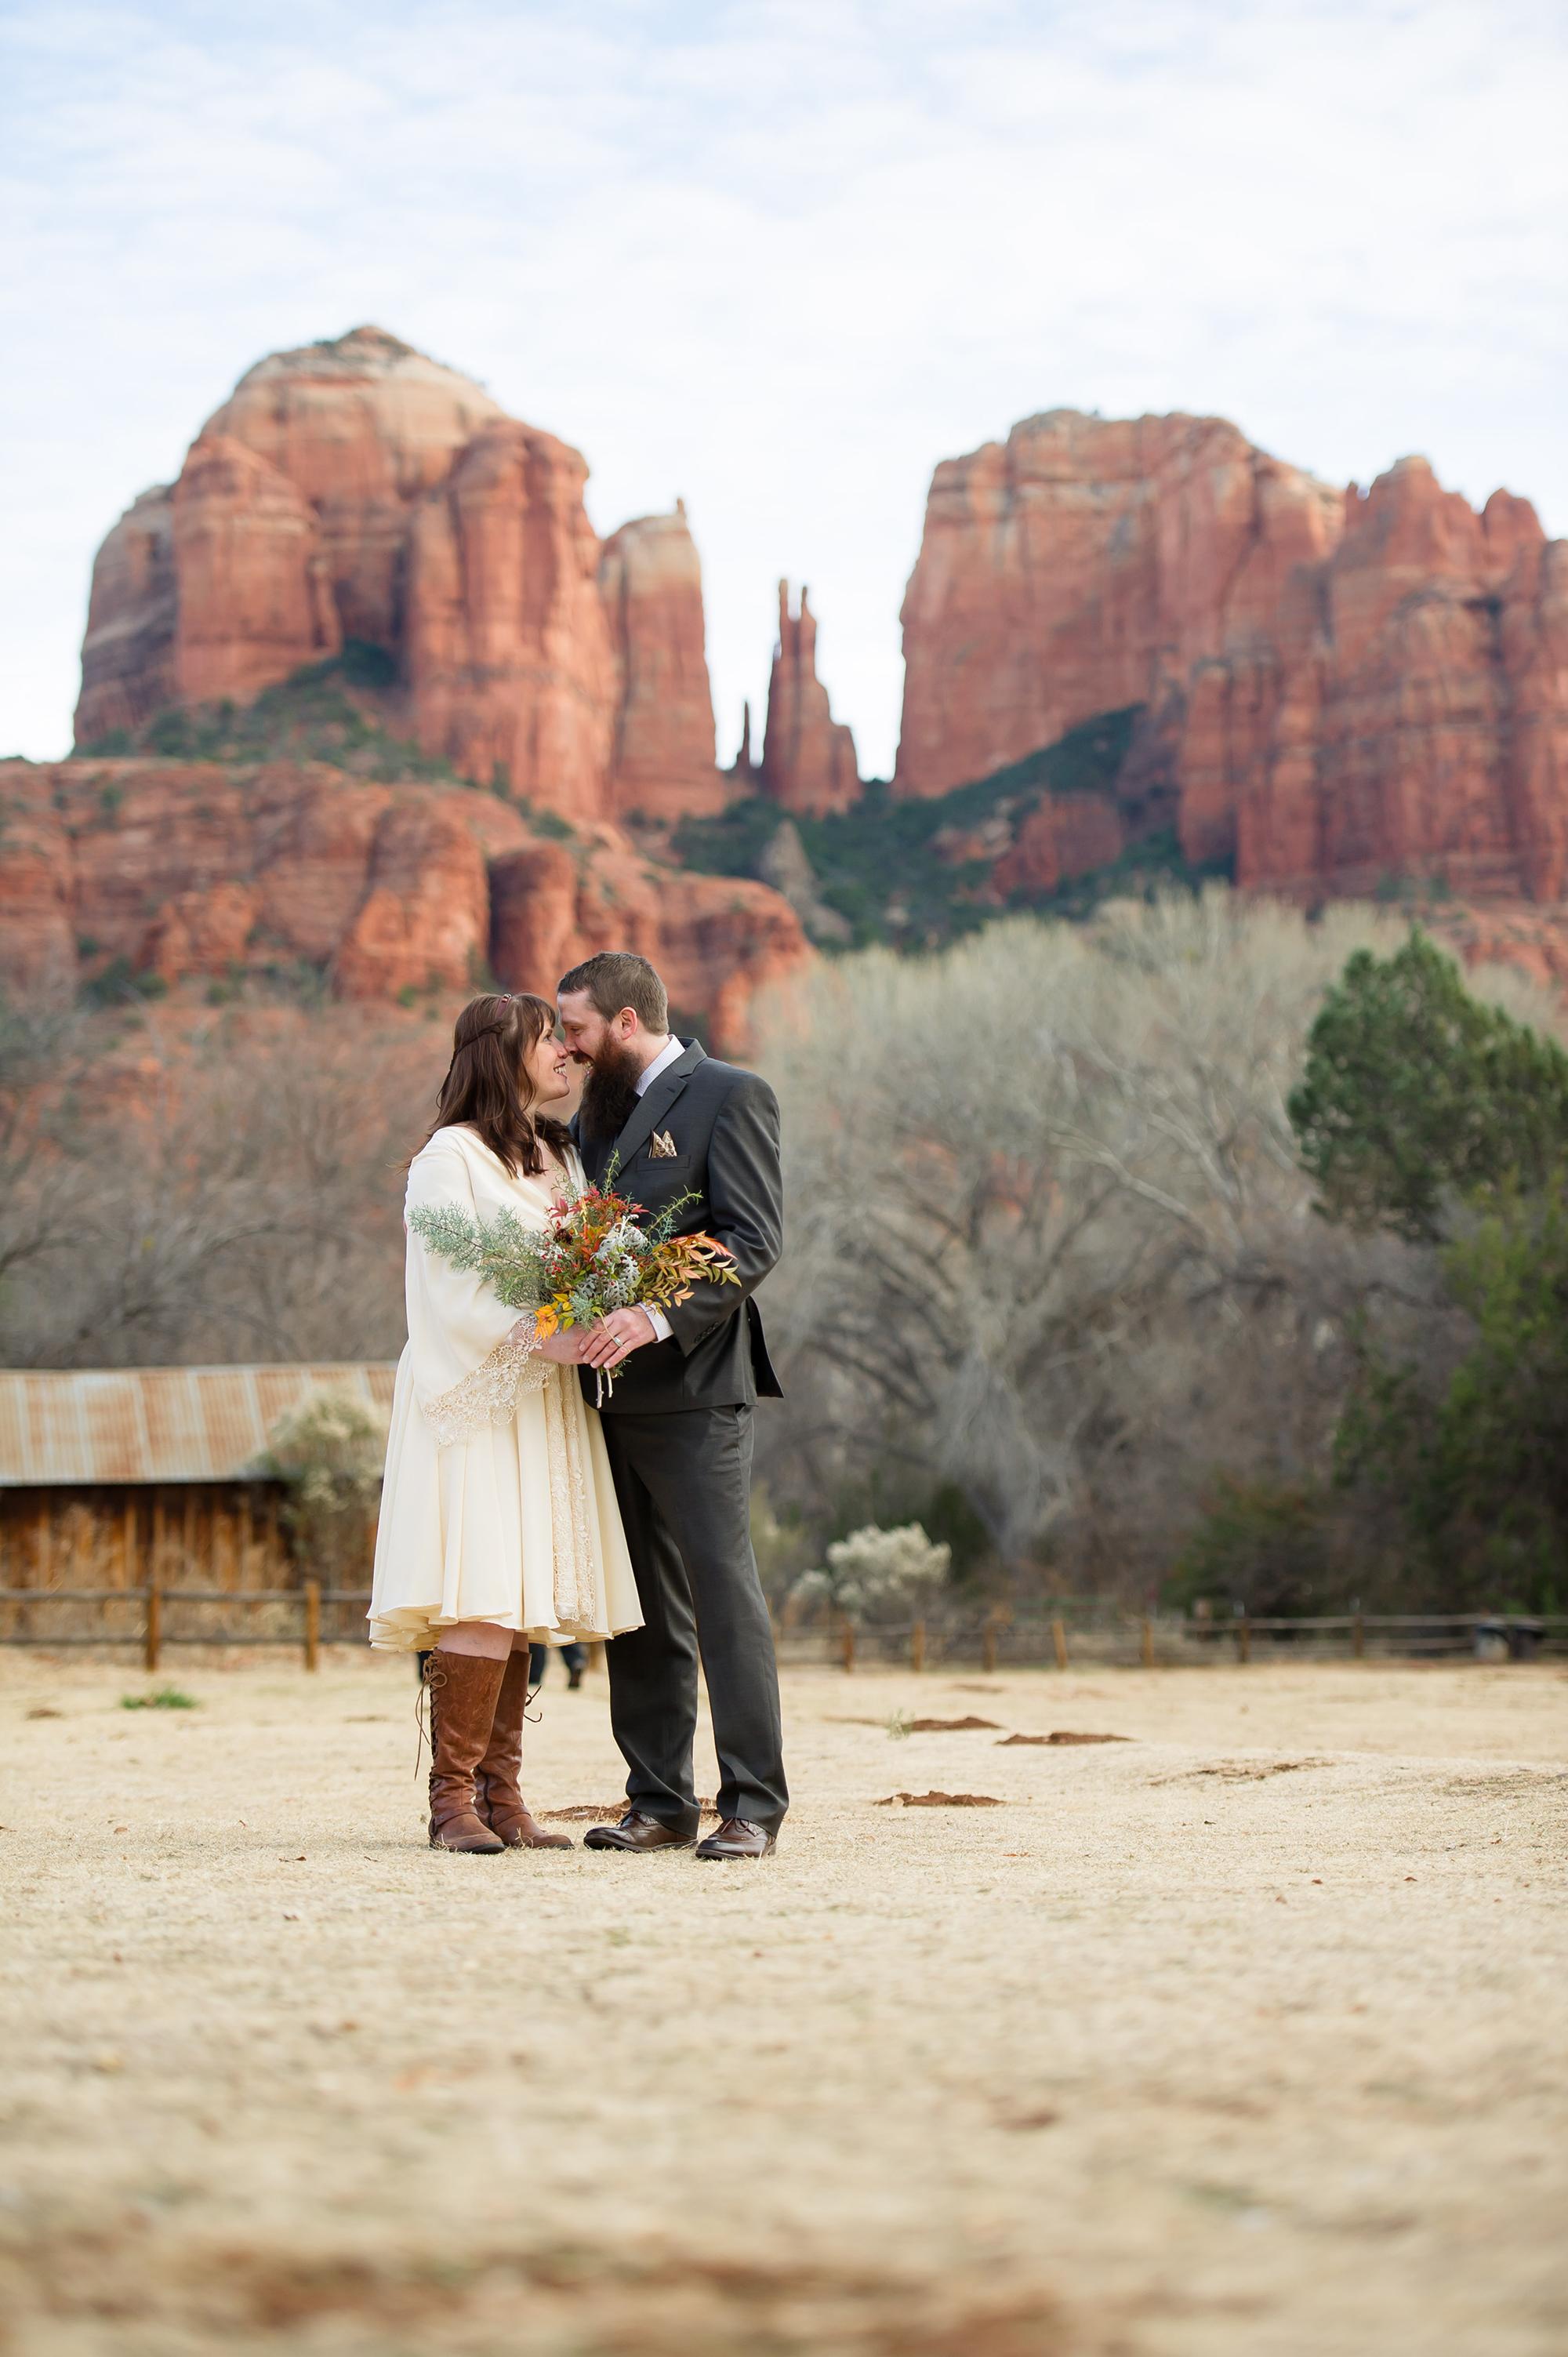 Custom Wedding Dress Maker | Minneapolis Wedding Dress Shop